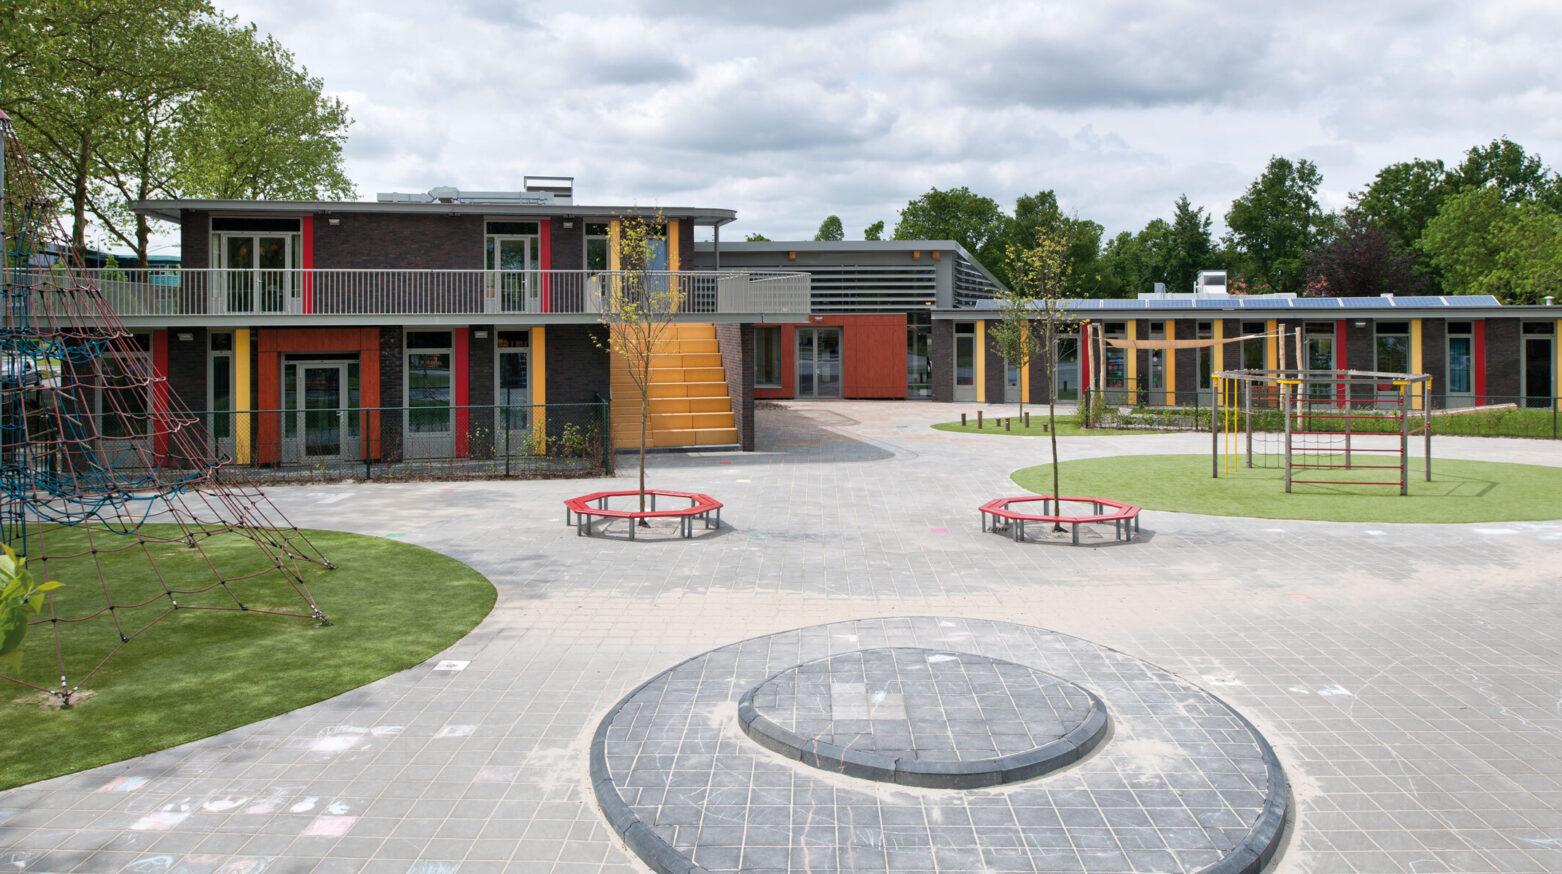 Kindcentrum oirschot buiten6